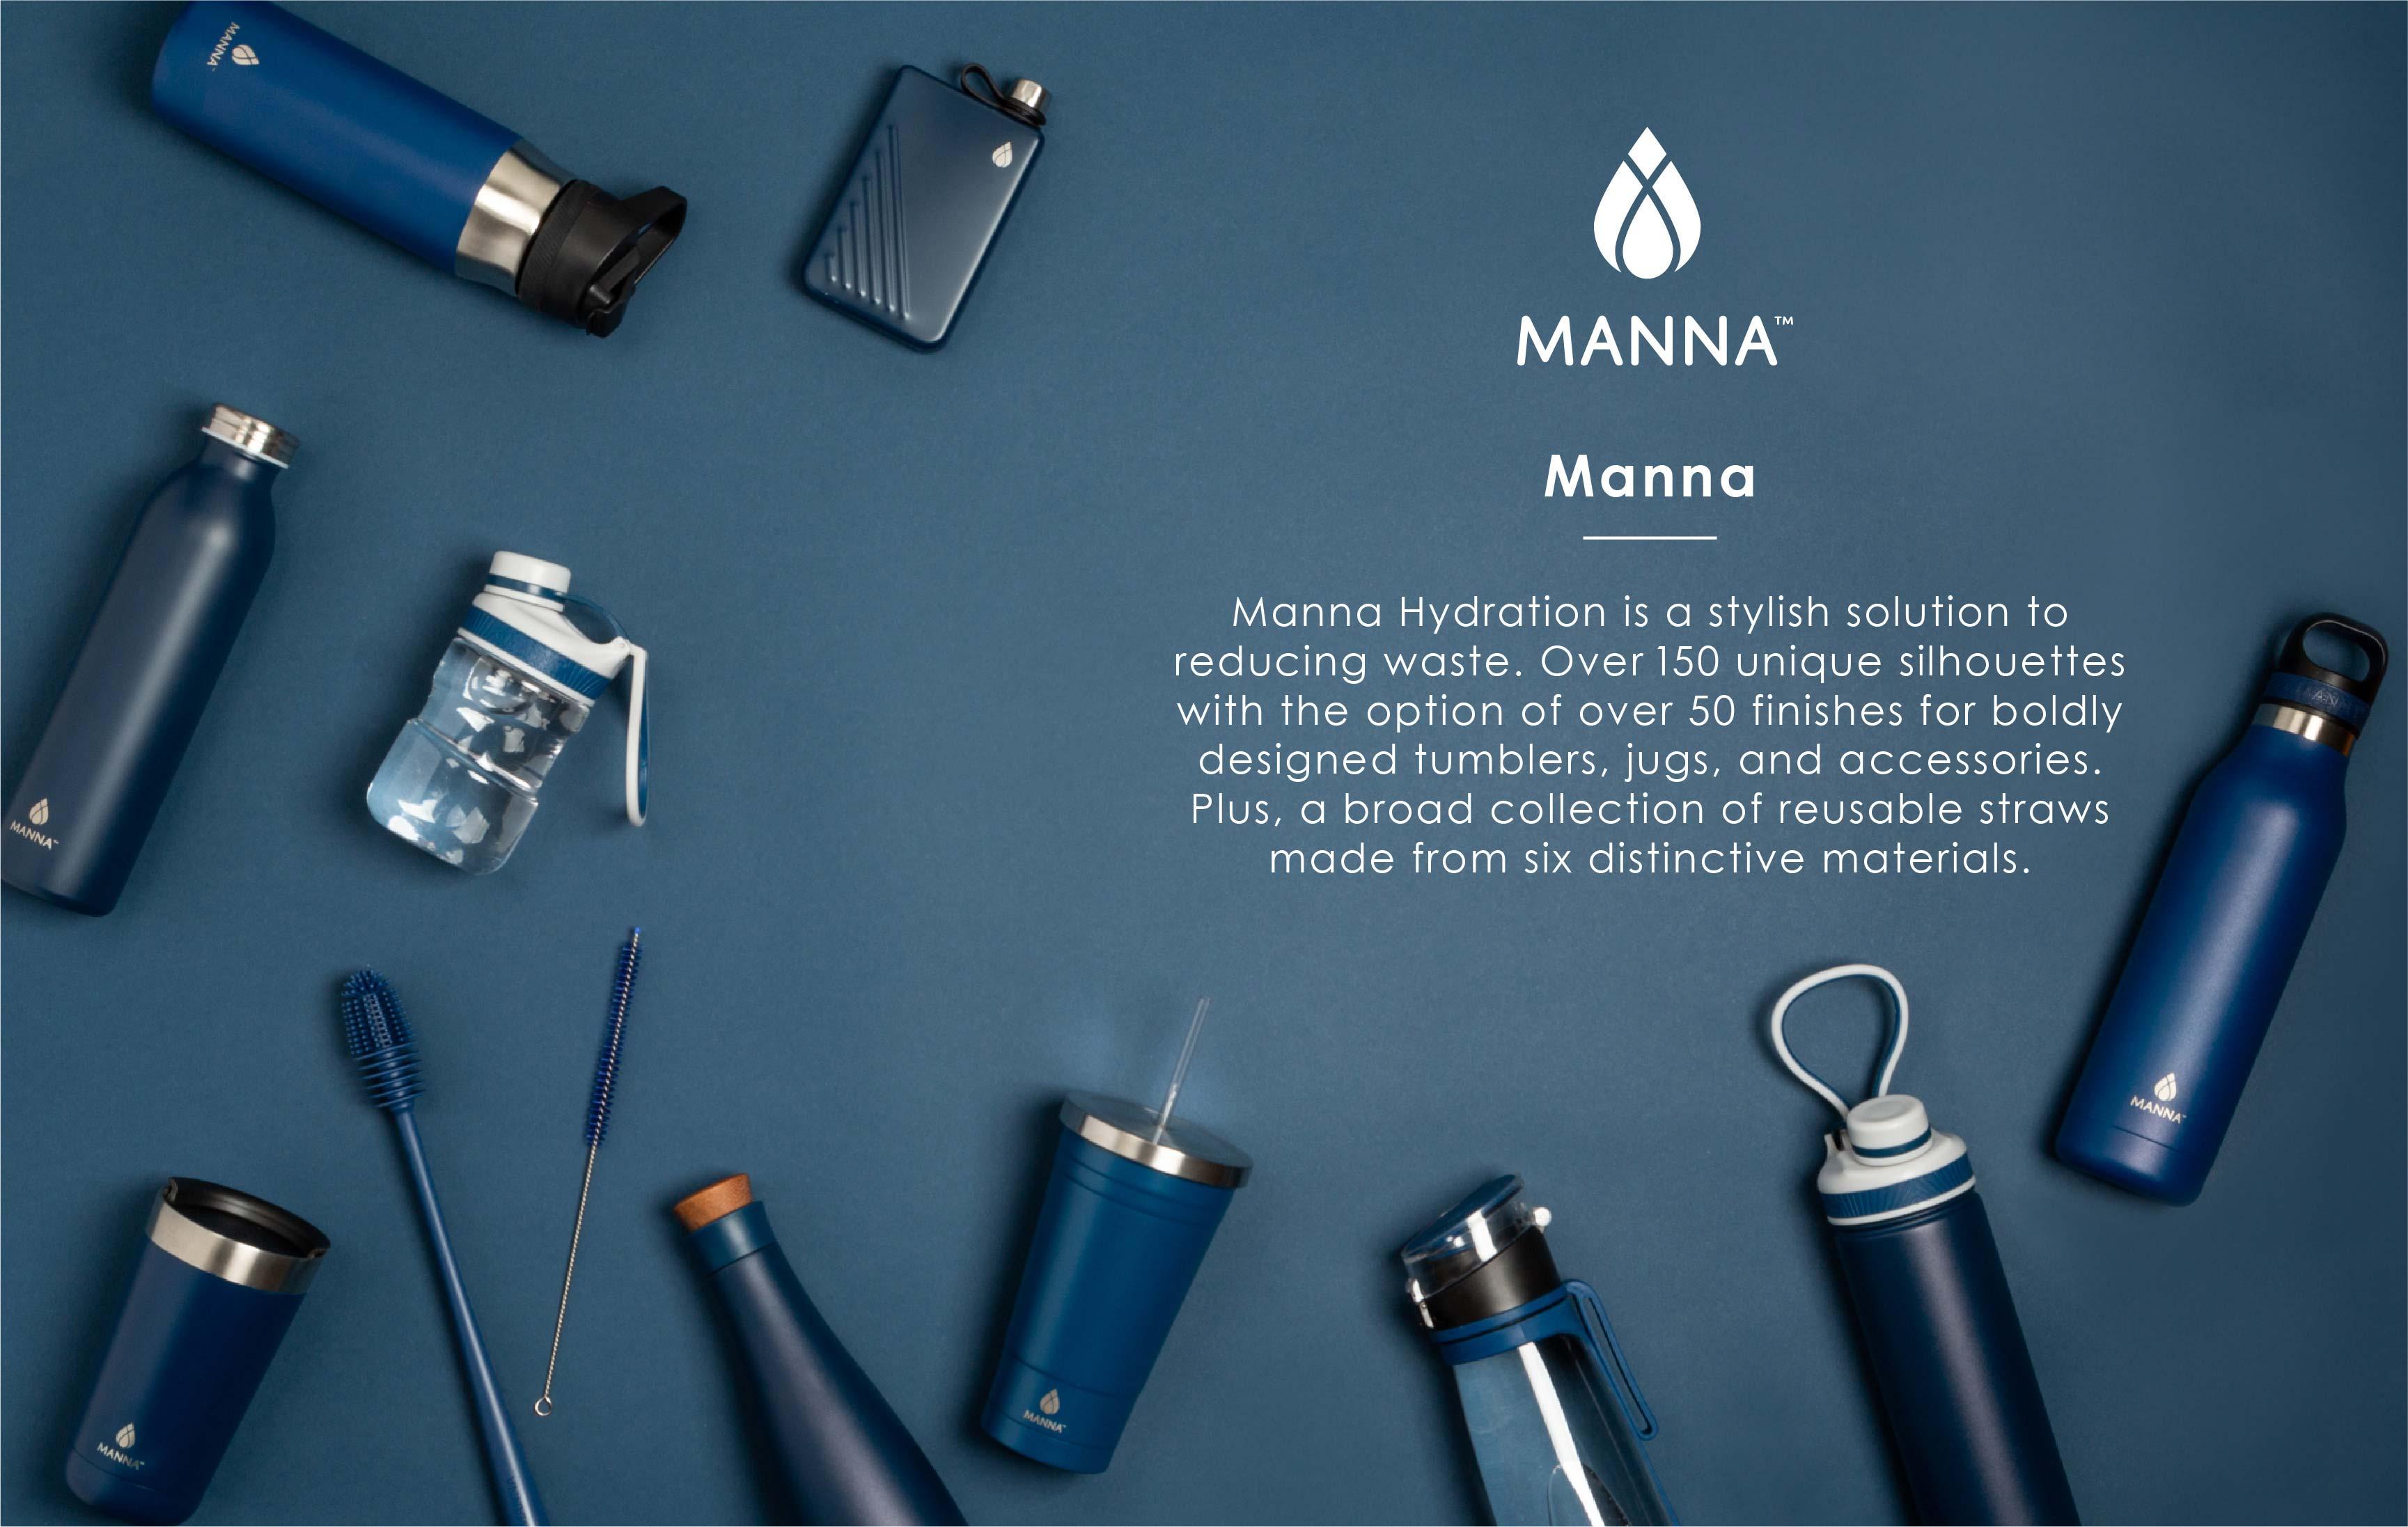 Our_Brand_Manna